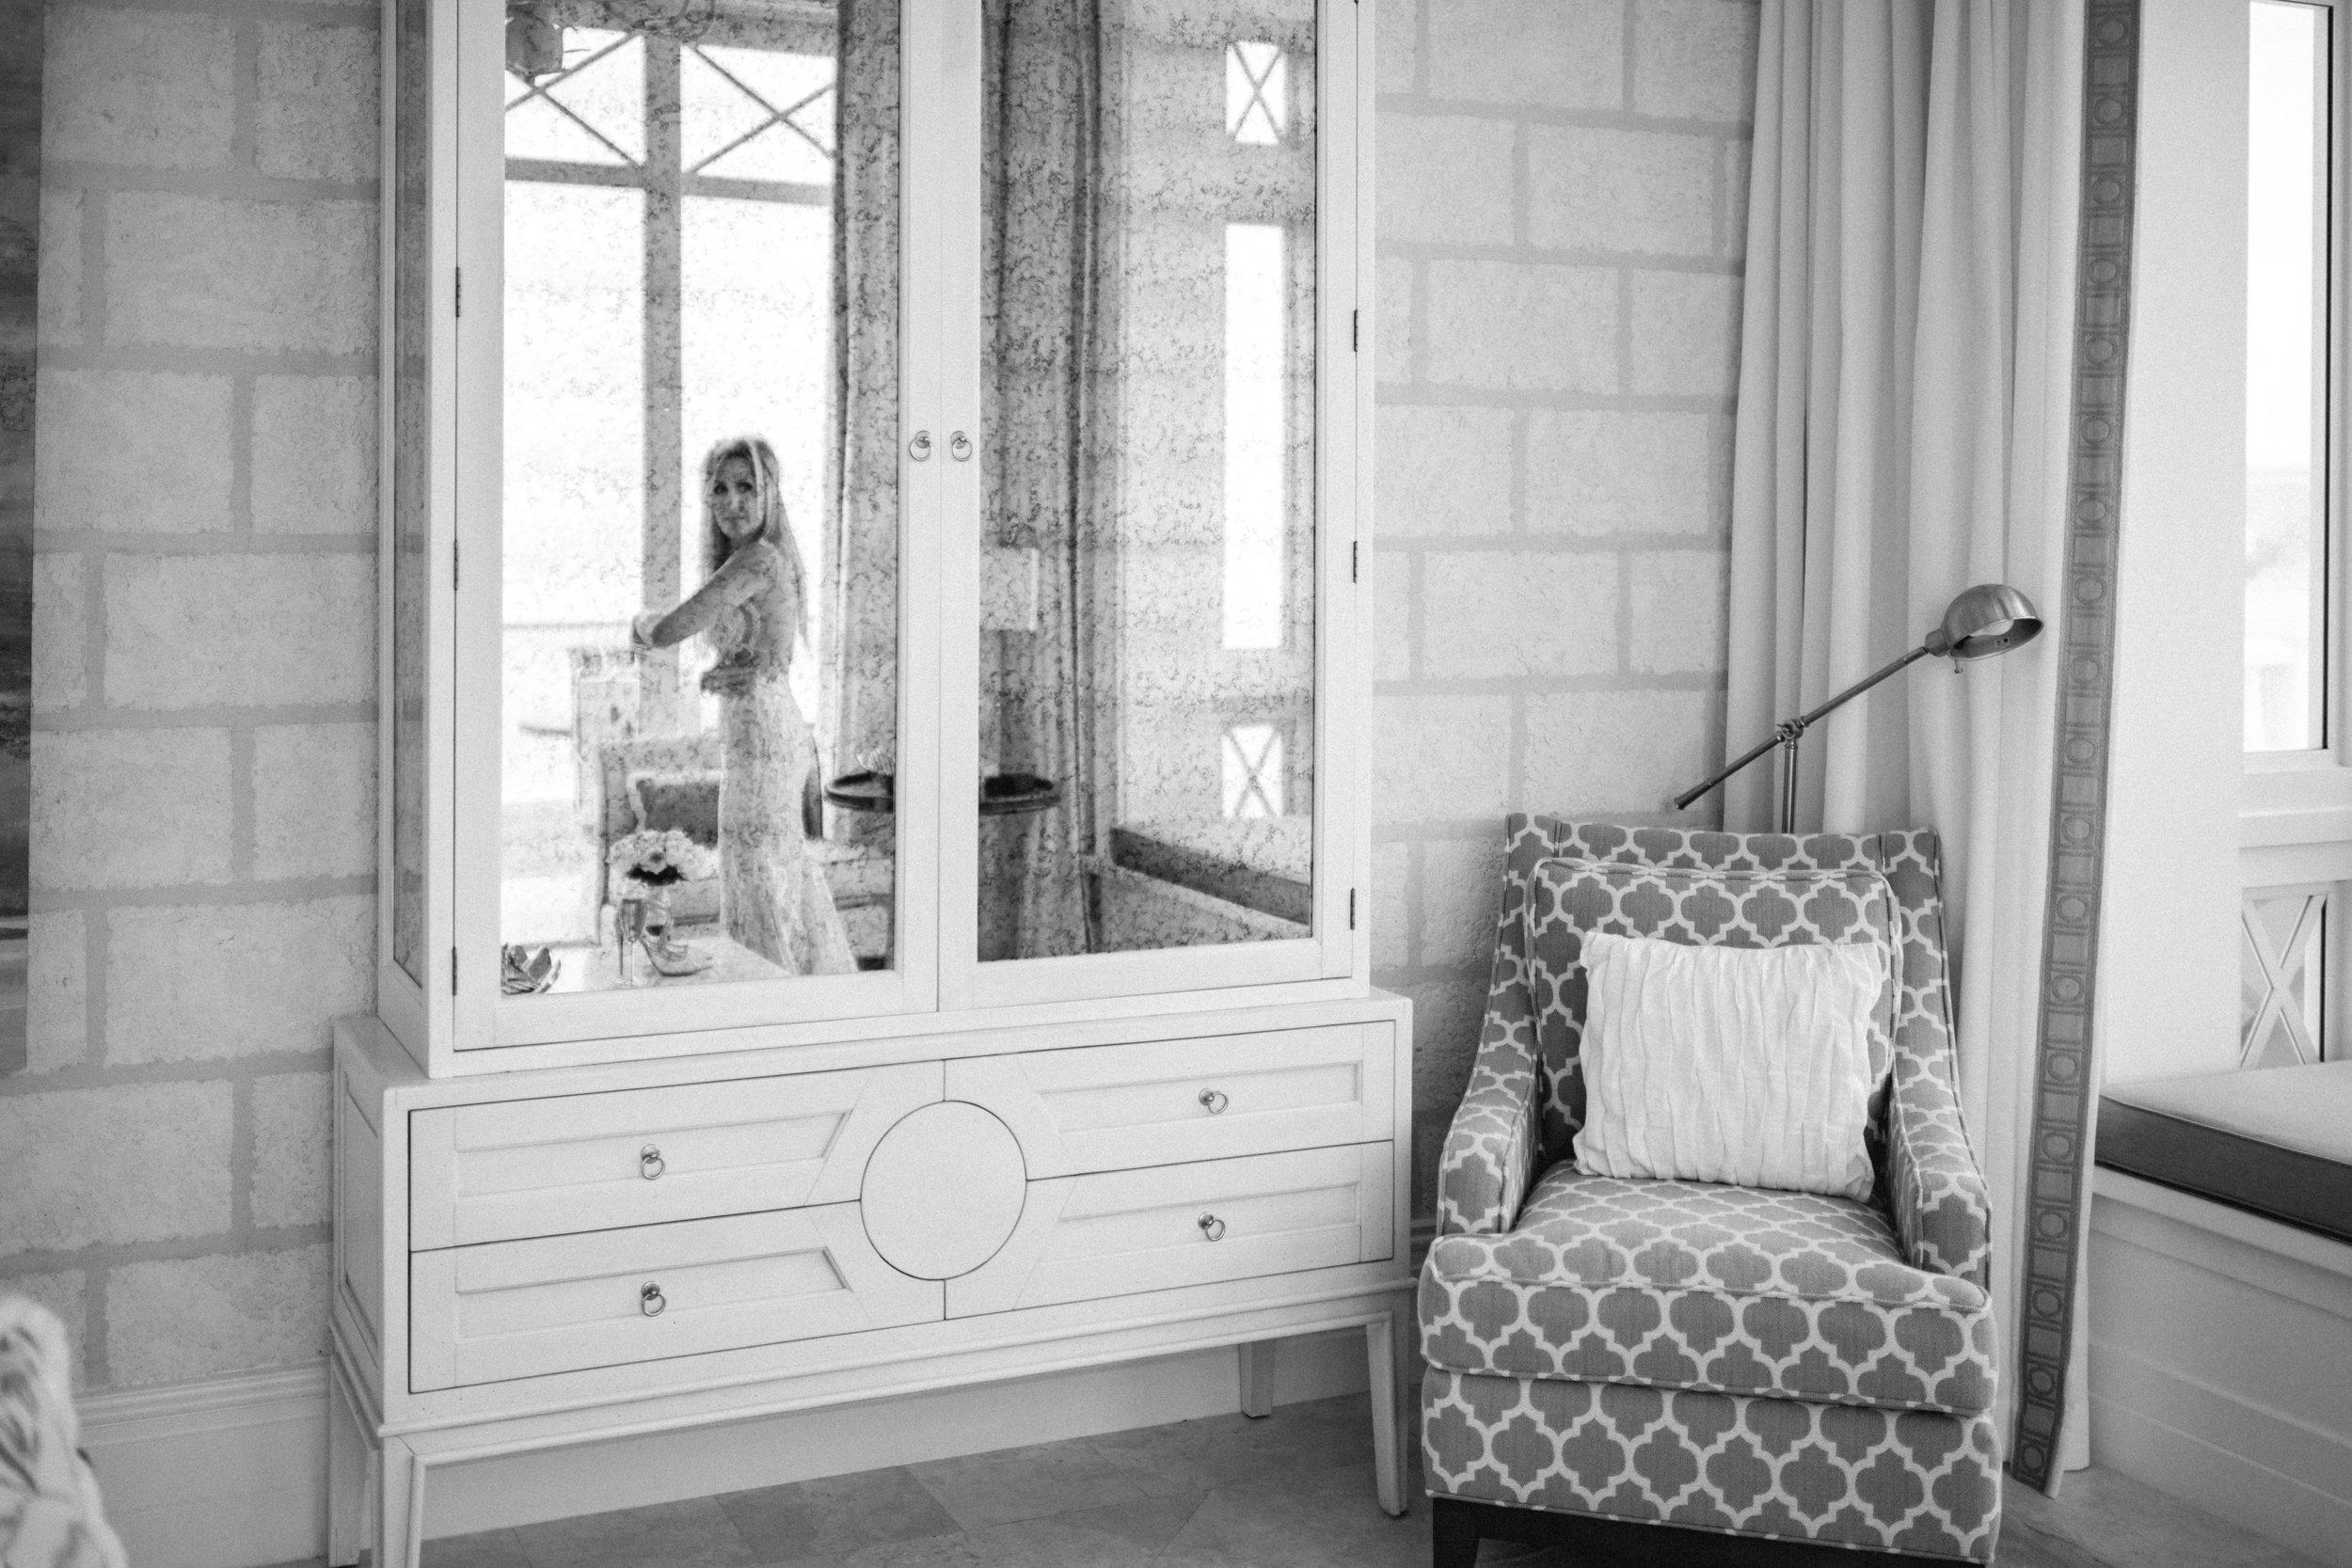 Long Bay Beach wedding photographer Matt Steeves Turks Caicos.jpg